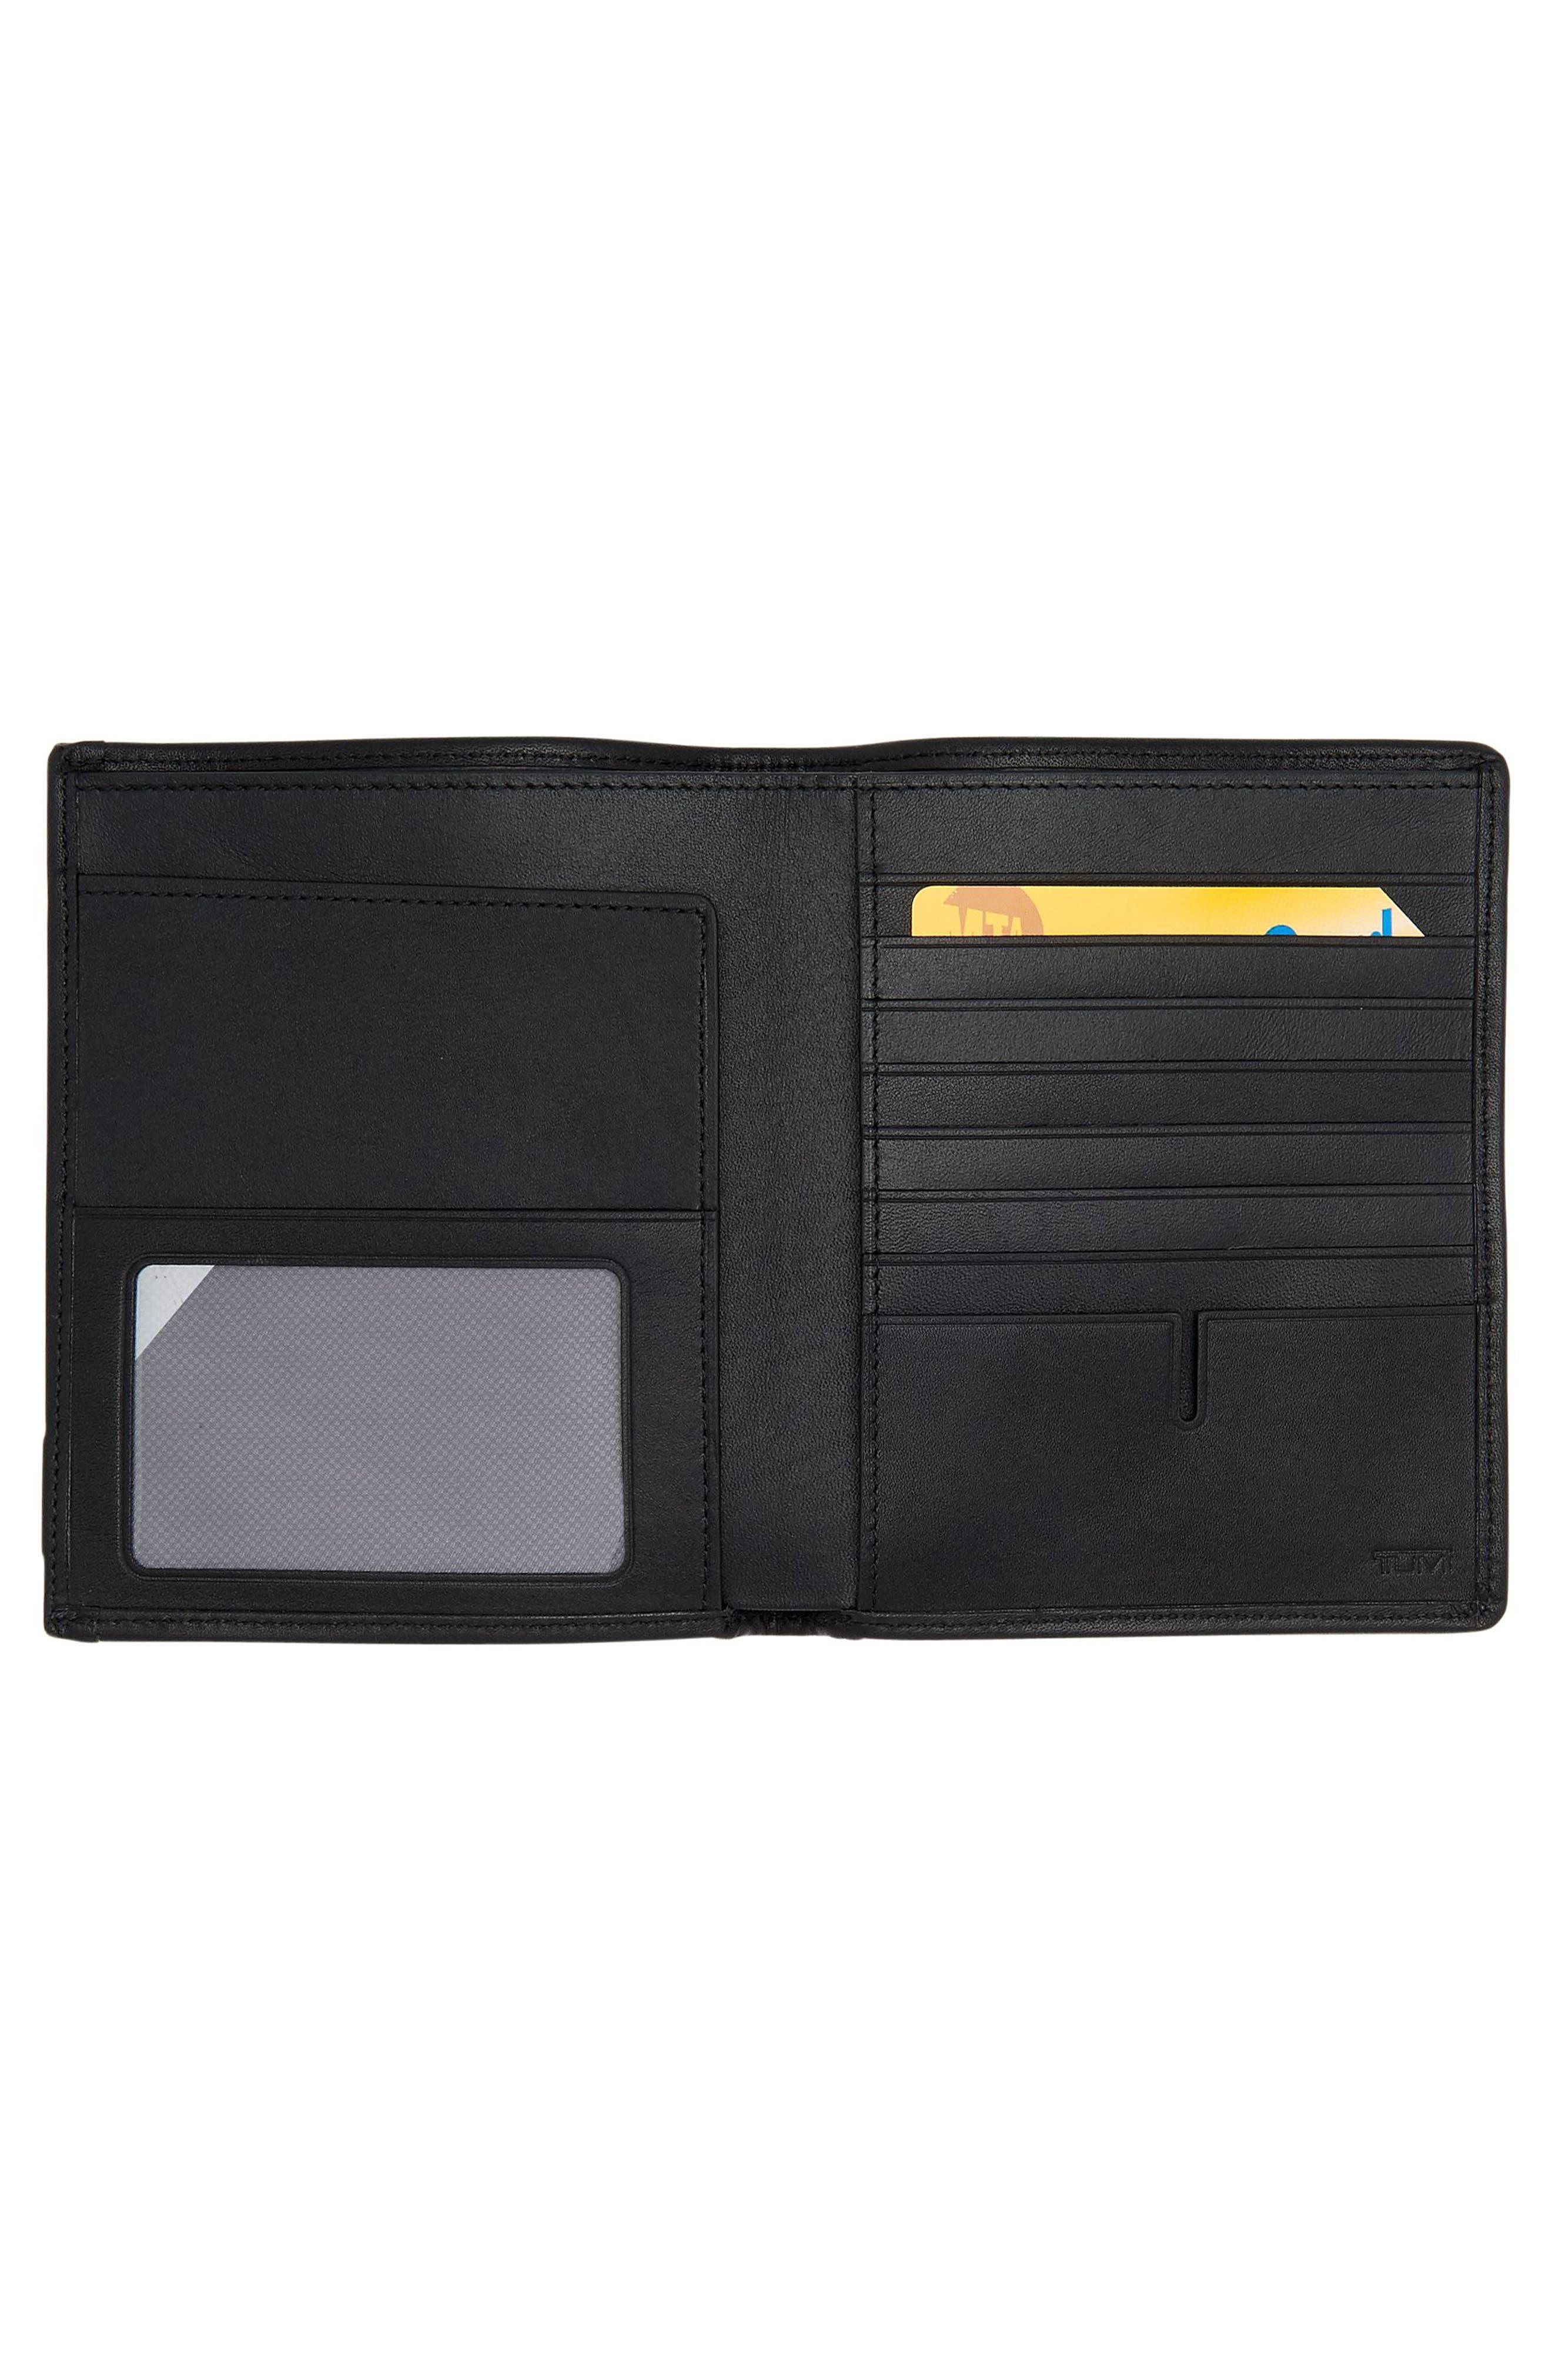 Alpha Passport Case,                             Alternate thumbnail 2, color,                             Anthracite/ Black